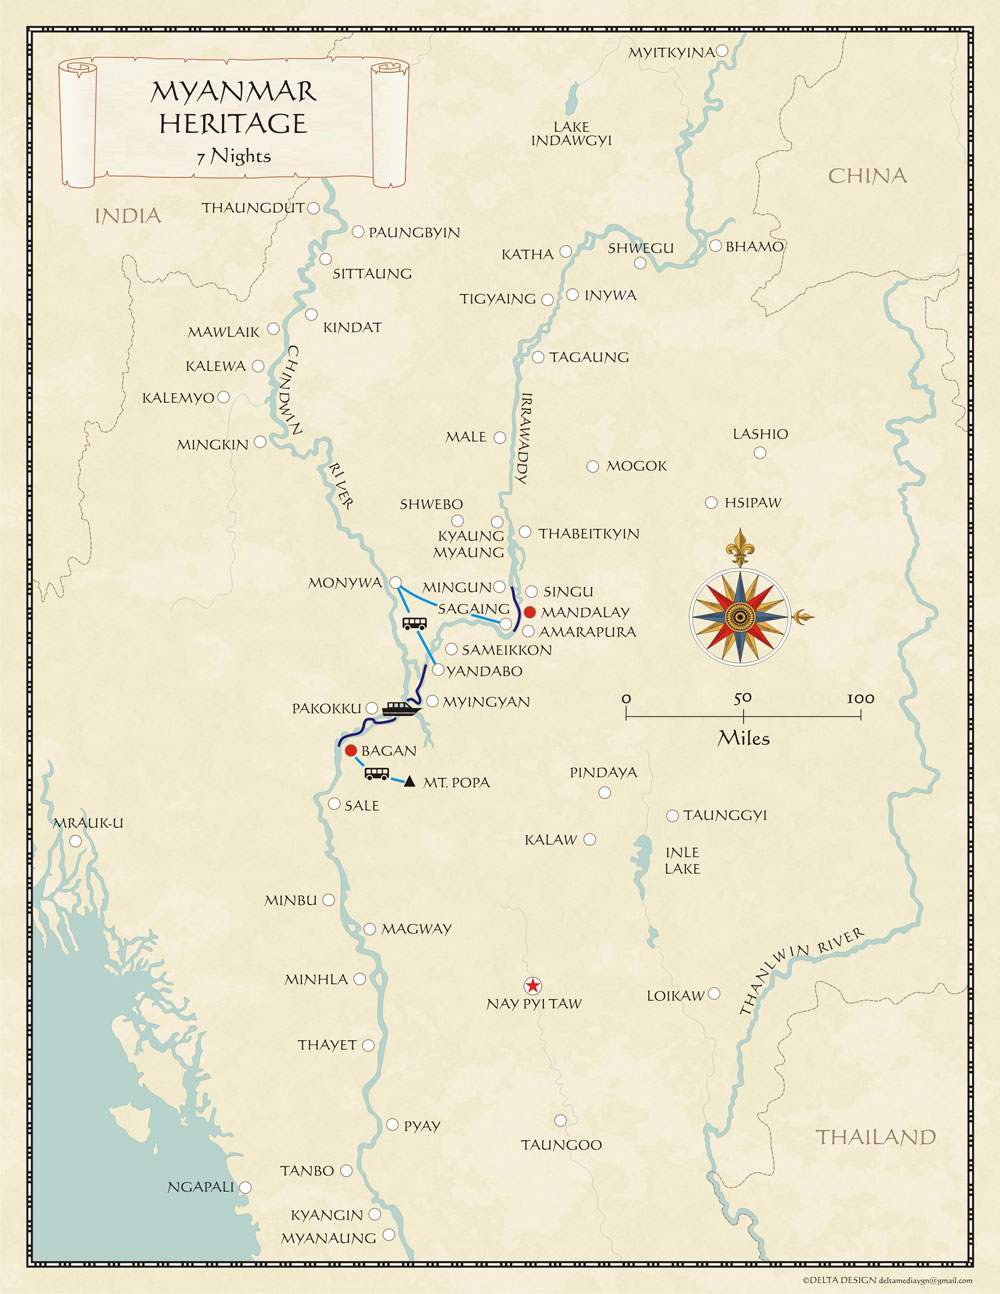 Myanmar Irrawaddy Cruise Map